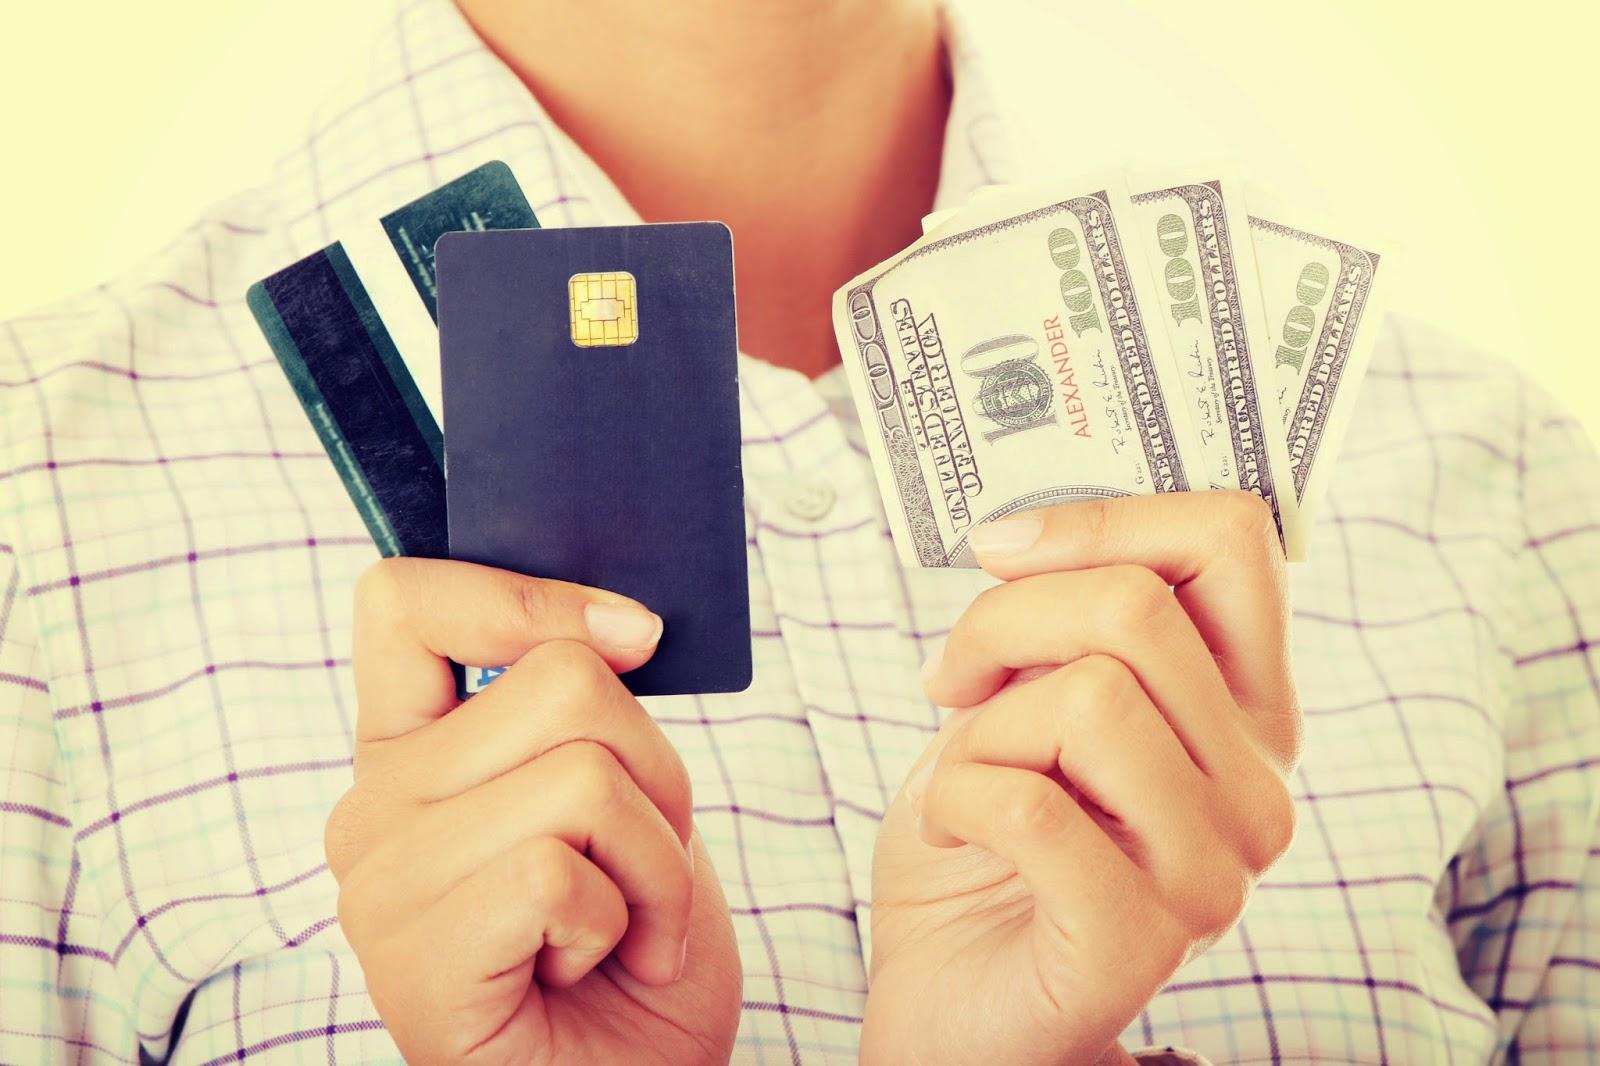 Tarjetas versus créditos